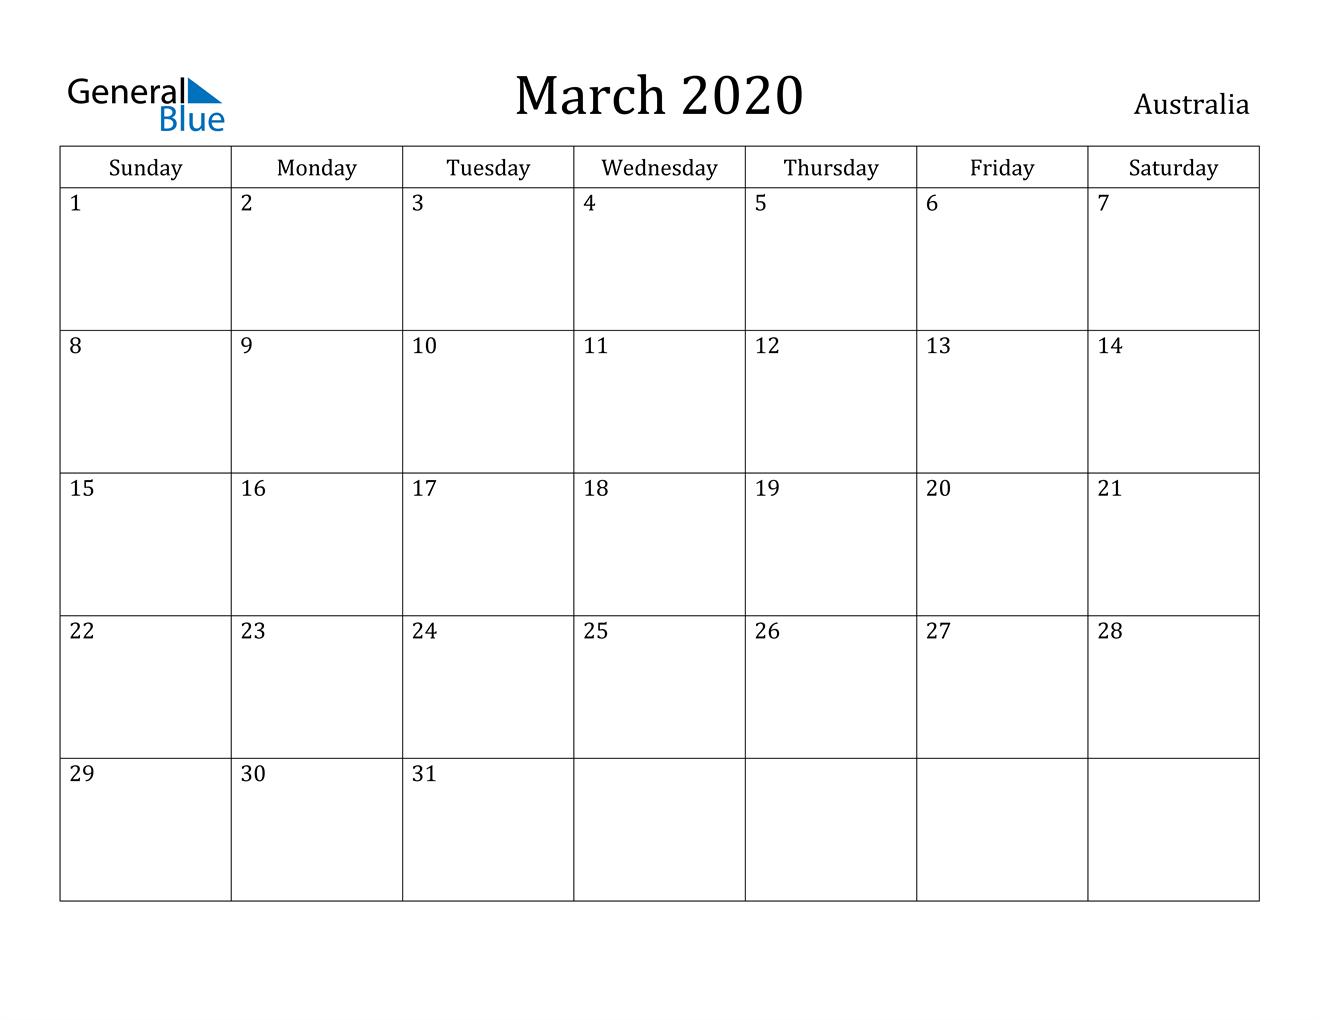 Image of March 2020 Australia Calendar with Holidays Calendar